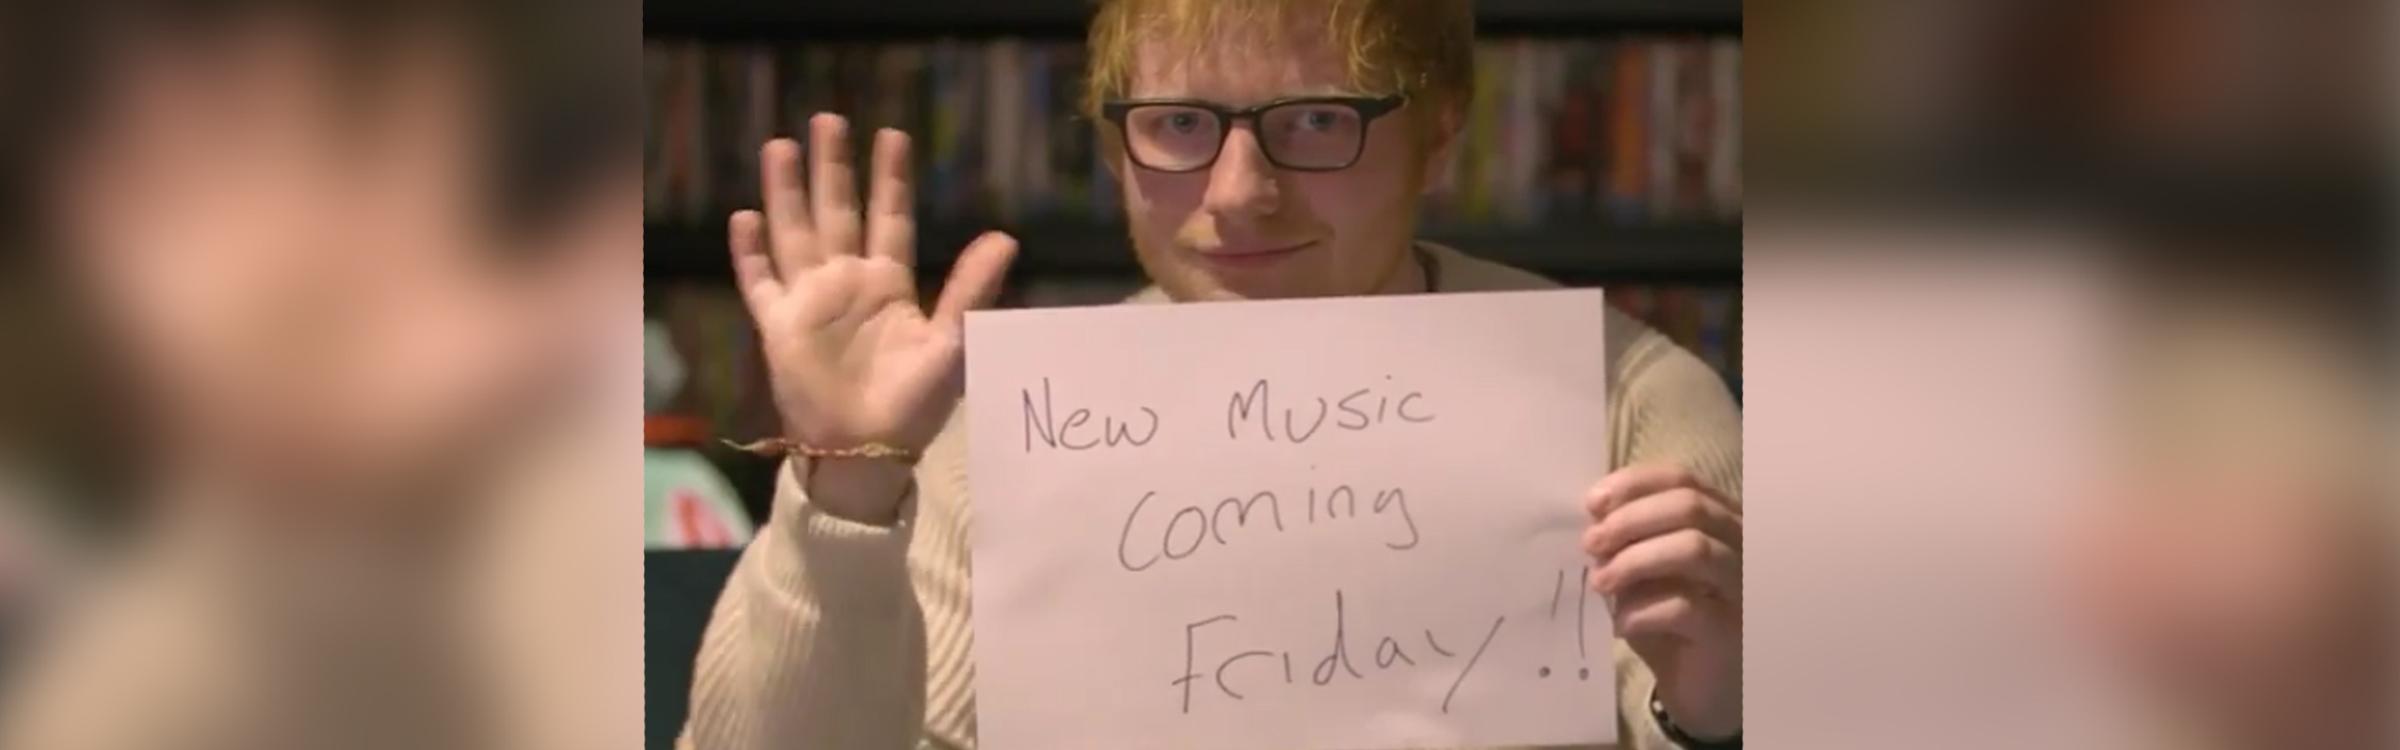 Ed newmusic header